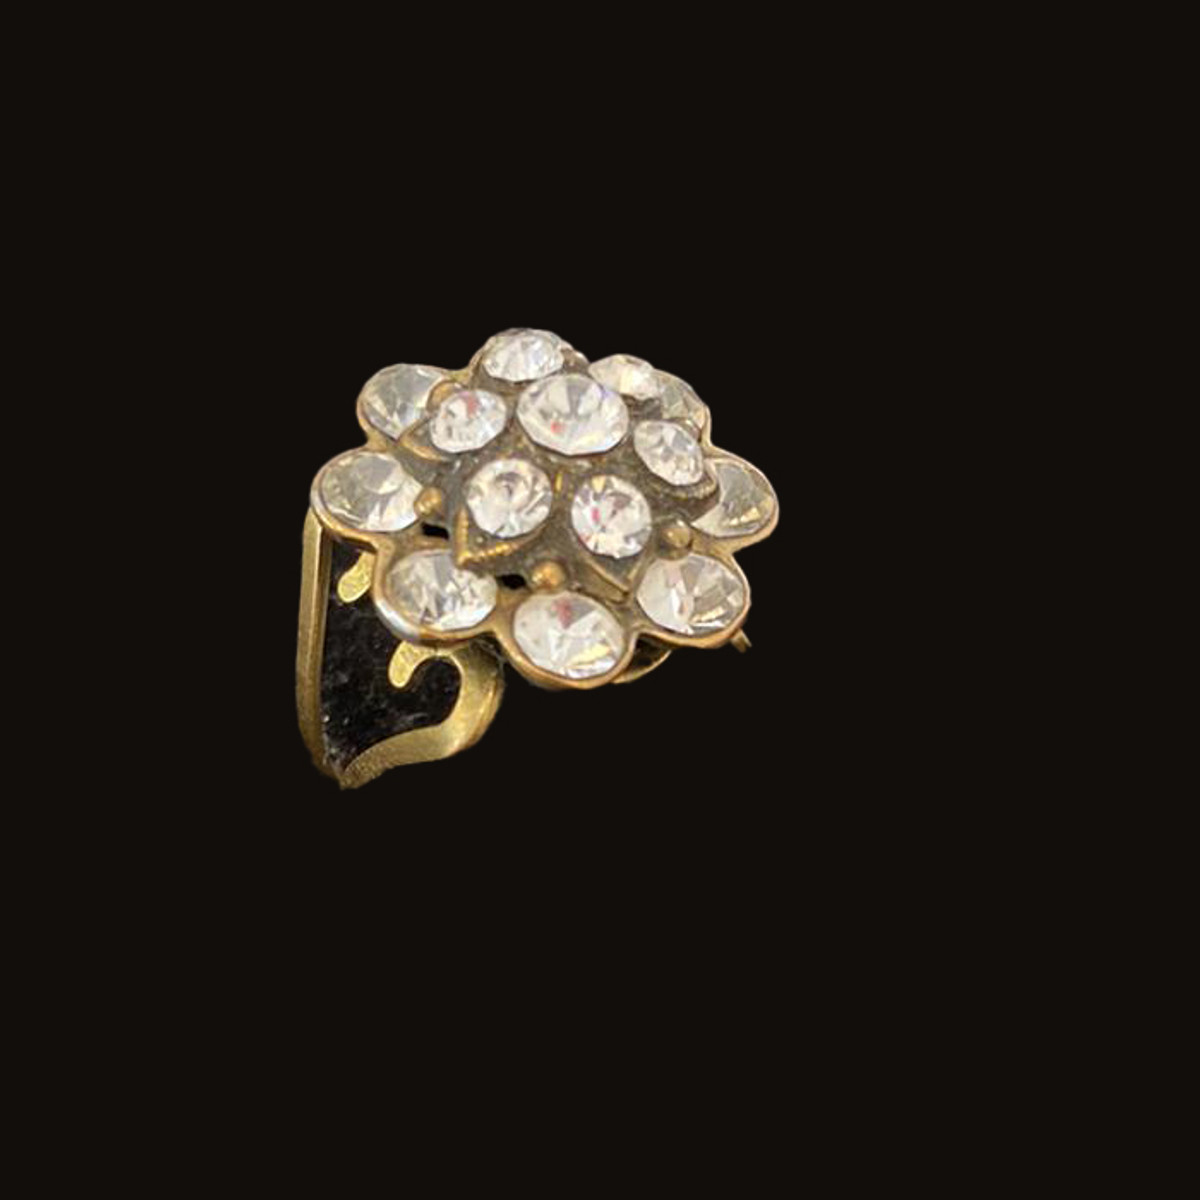 Michal Negrin Swarovski Crystals Icy Flower Adjustable Ring